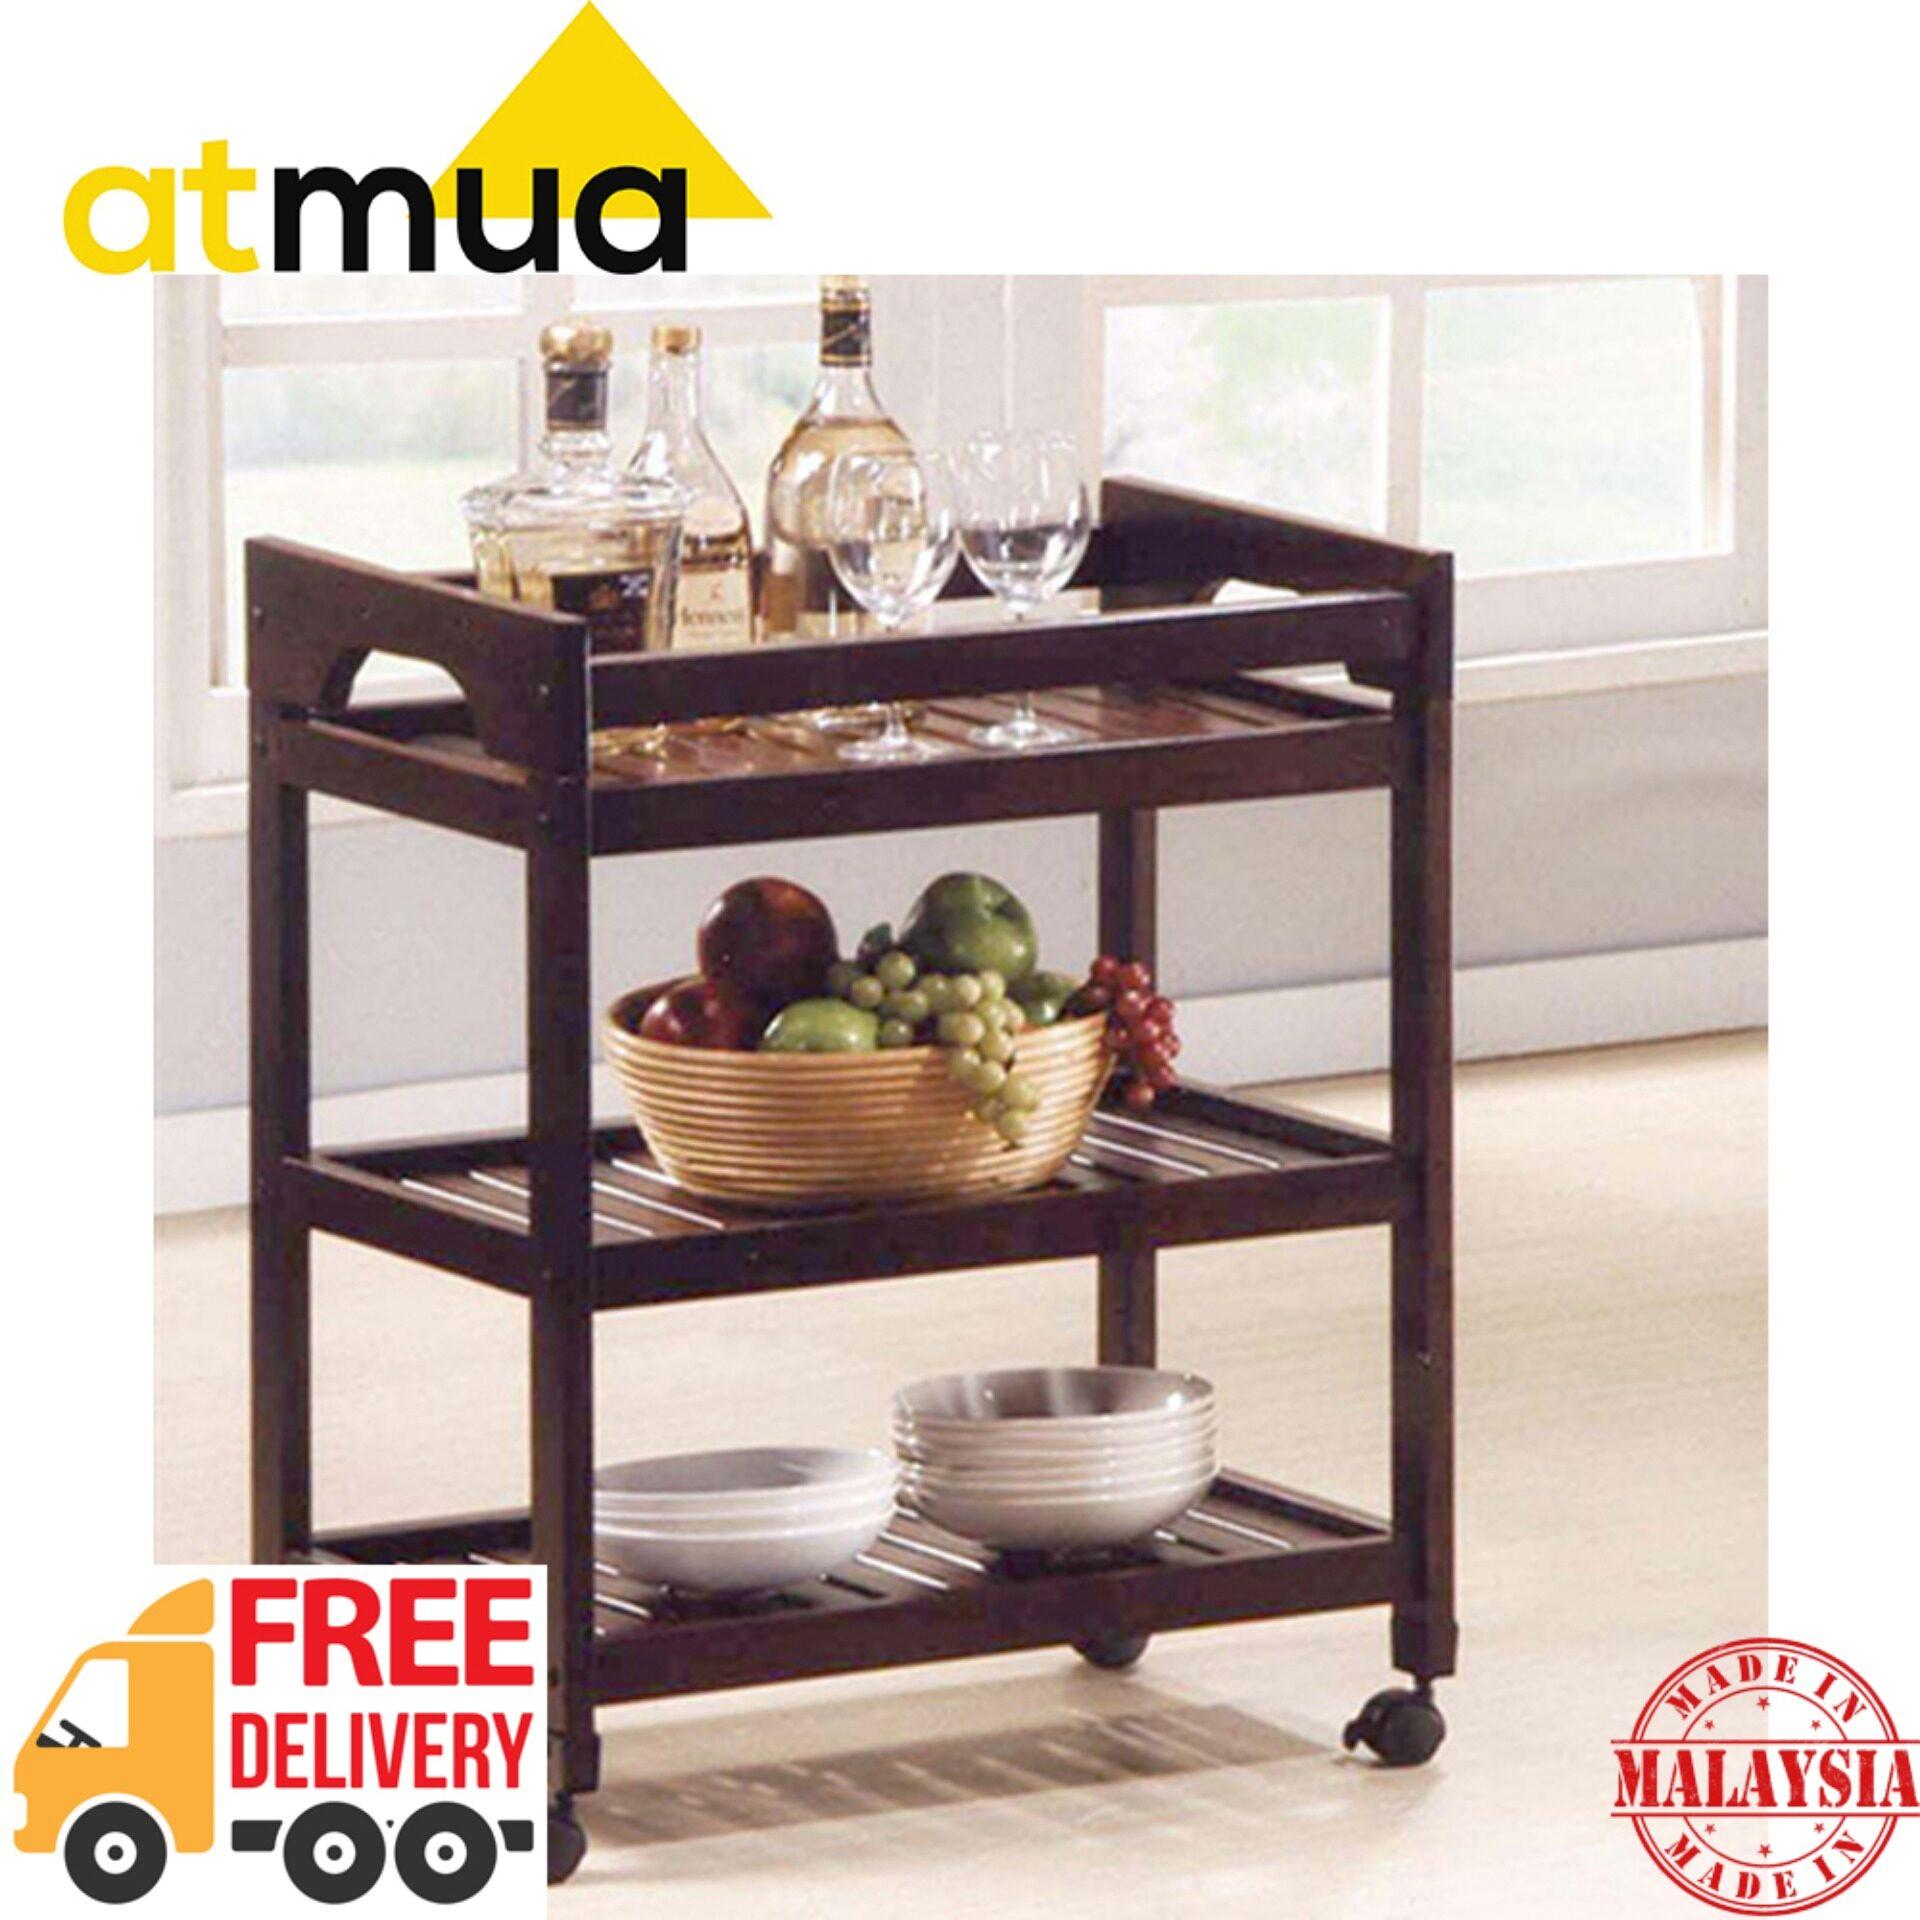 [FREE SHIPPING] Atmua Advo Trolley 3 Tier Trolley Kitchen Storage Racks Office Shelves [Full Solid Wood]